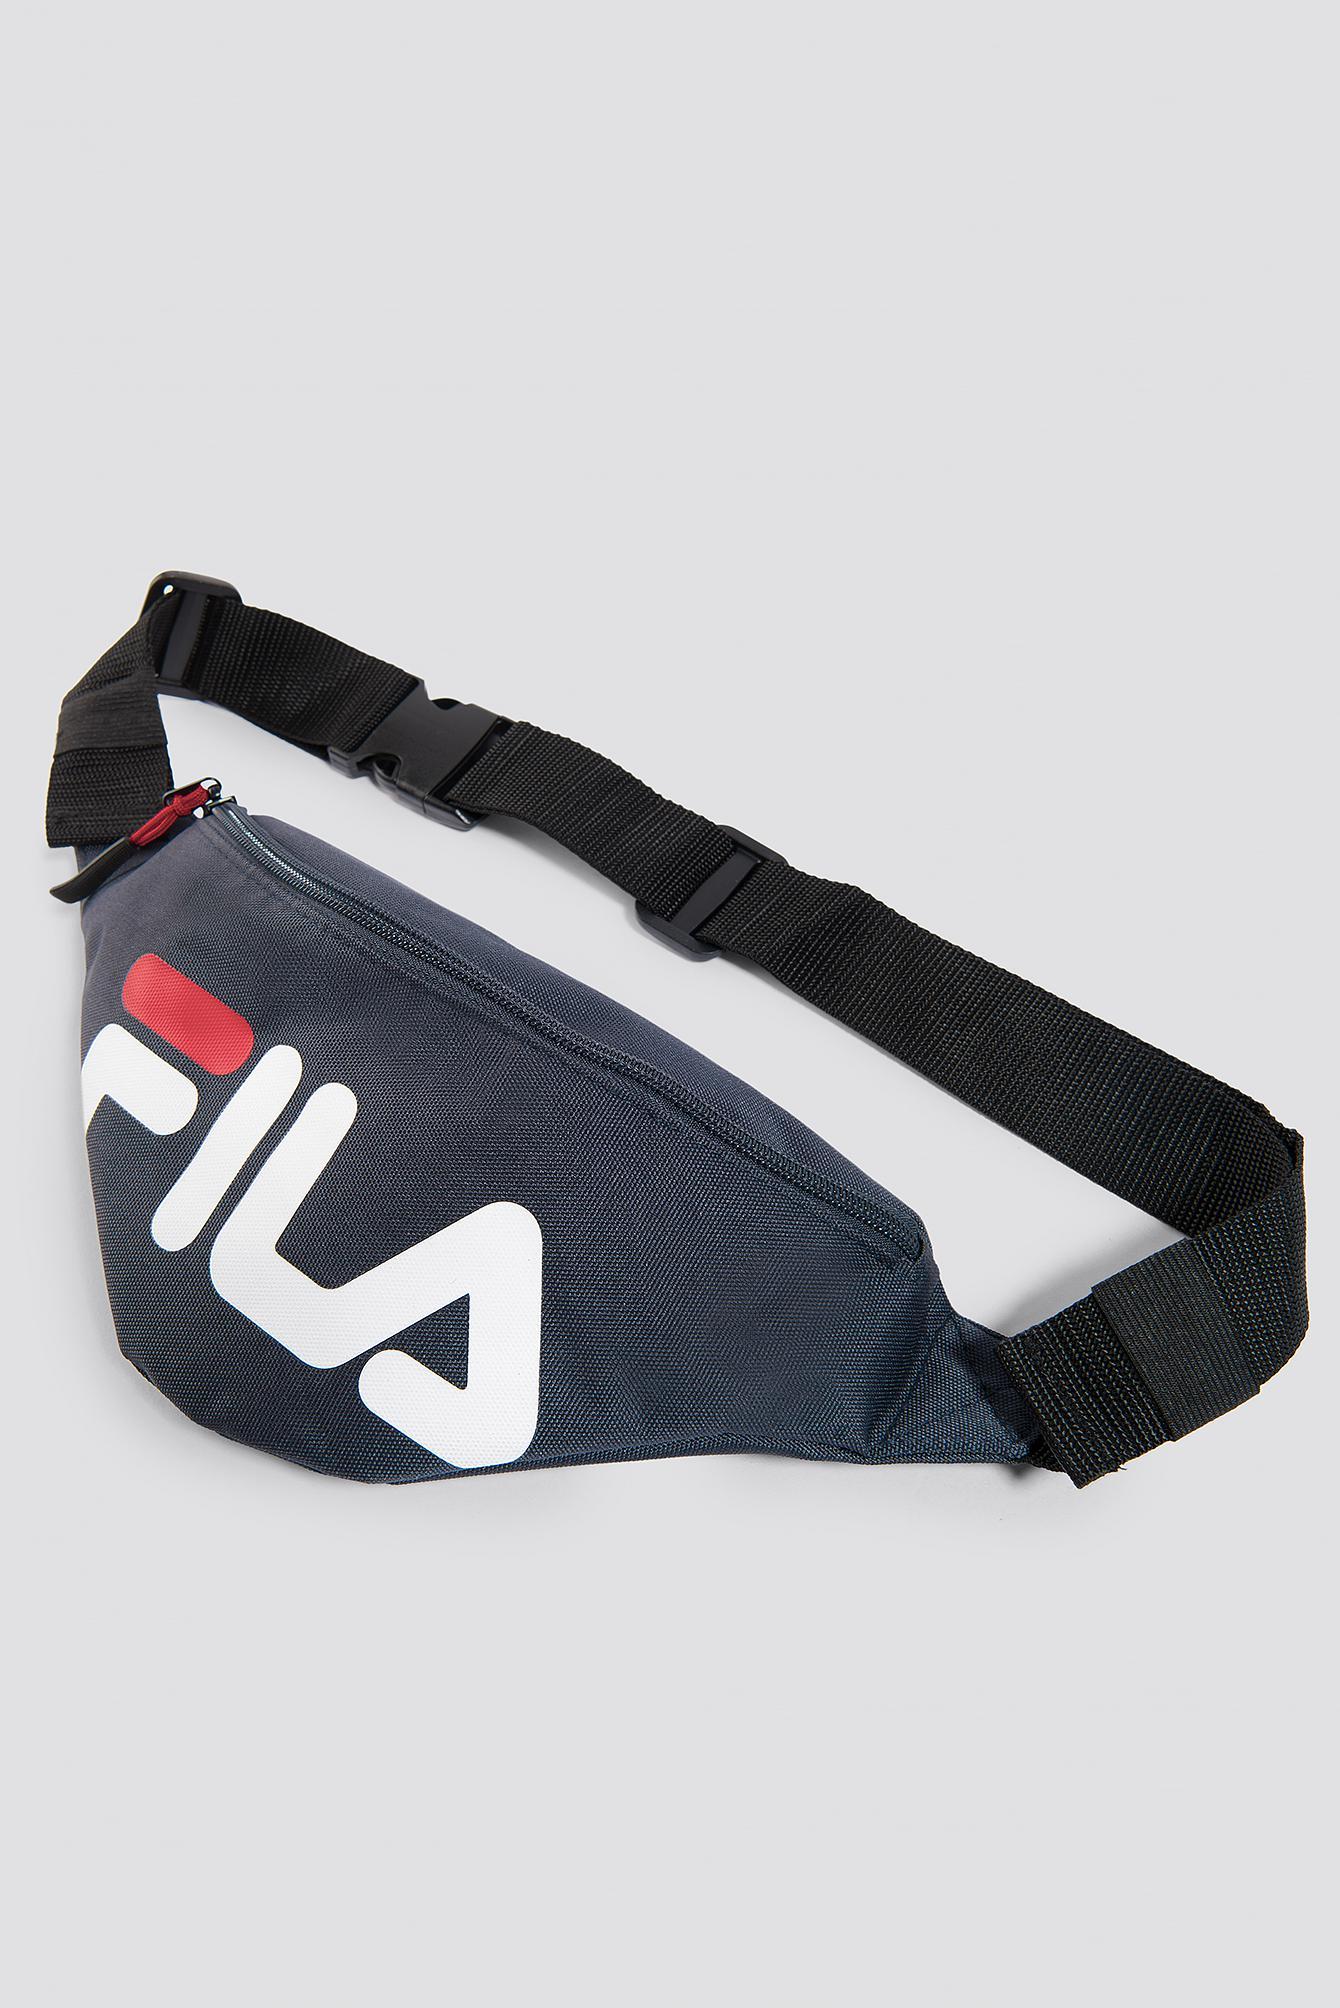 a98c56434ba5 Lyst - Fila Waist Bag Slim